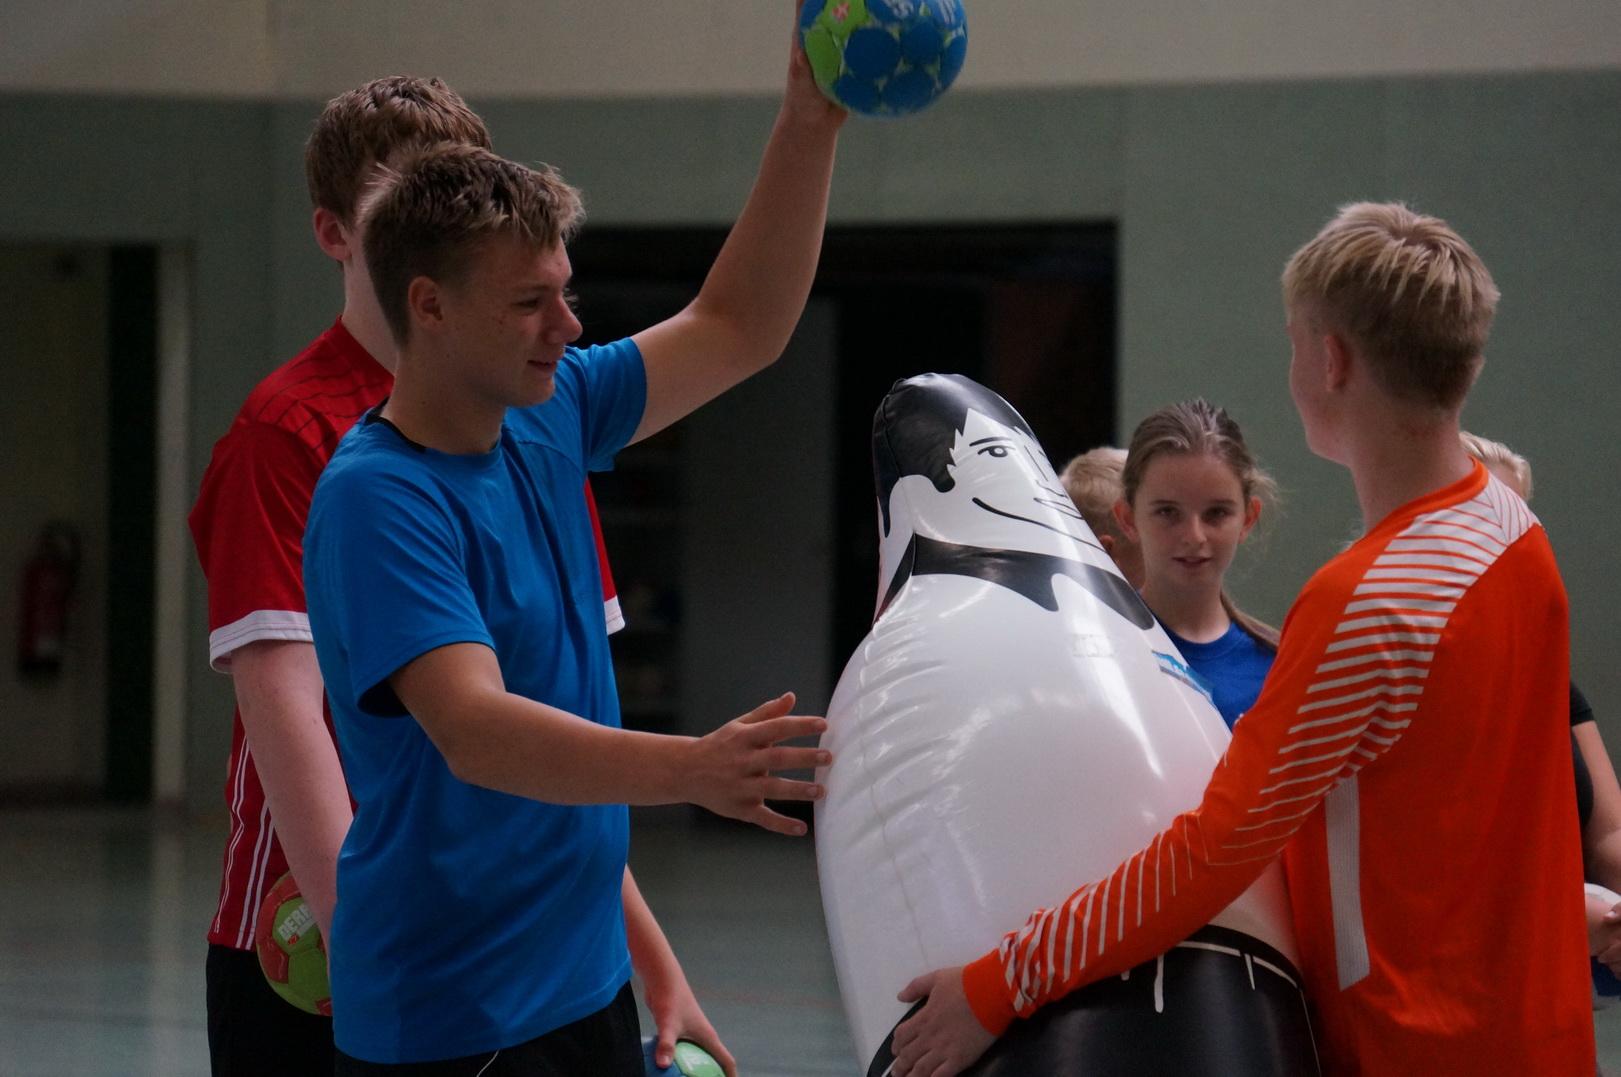 201808_Handballcamp_SDH_MG_215w